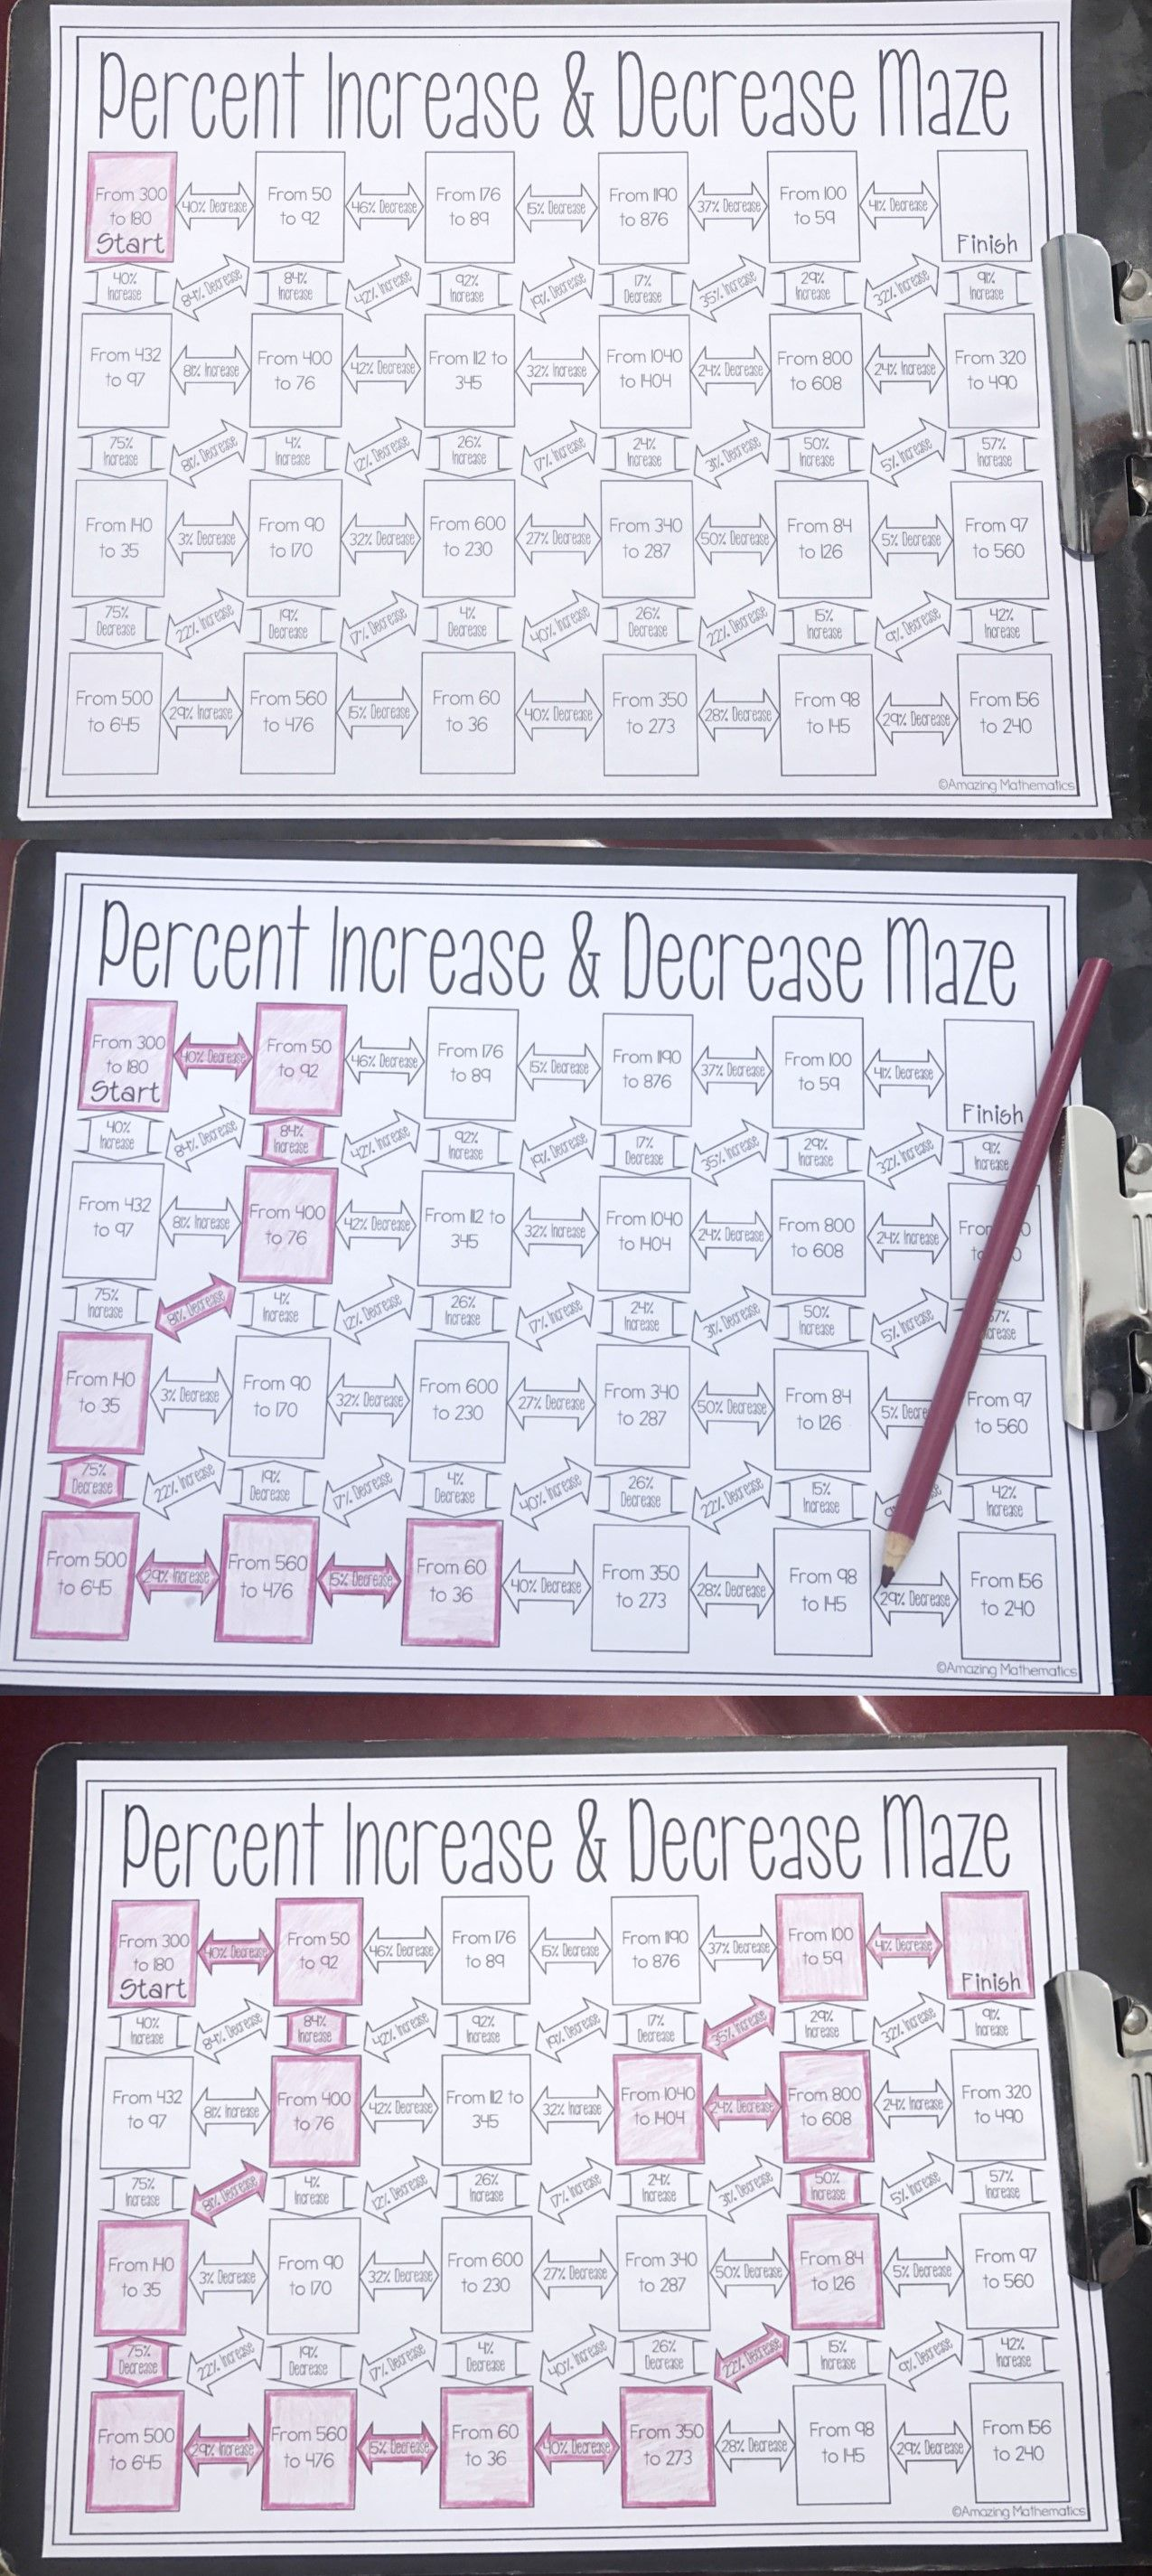 Percent Increase And Decrease Maze Worksheet